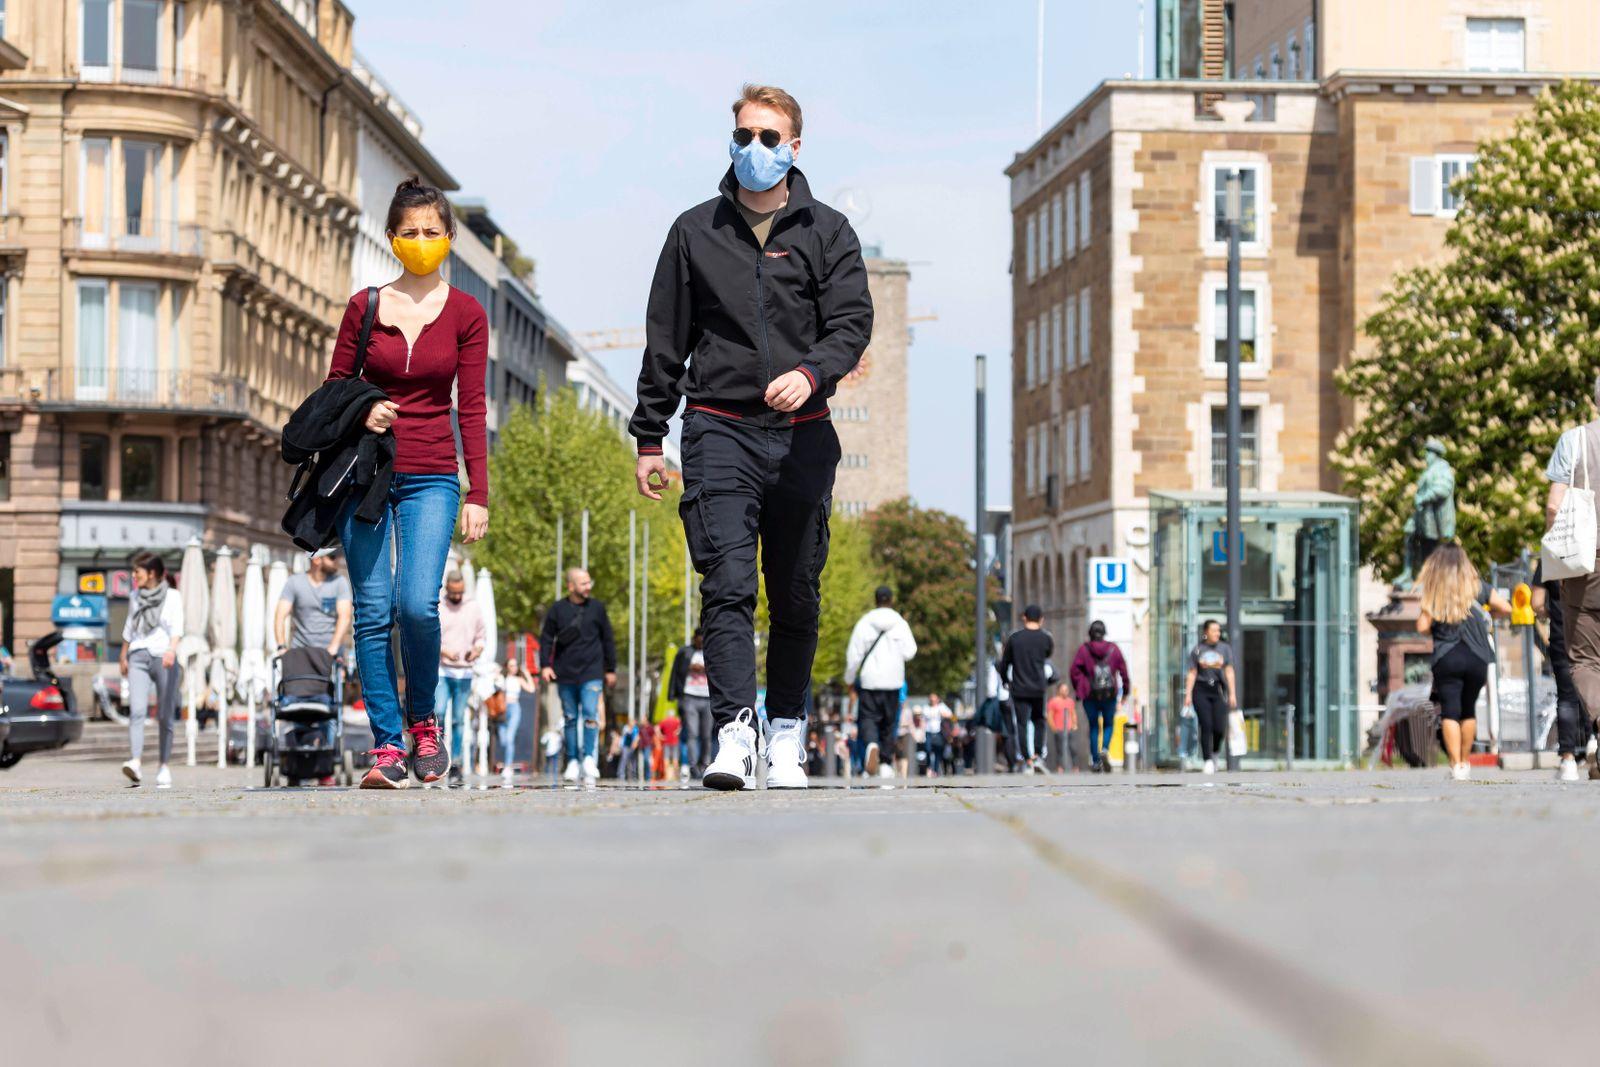 DEU, Deutschland, Baden-Württemberg, Stuttgart, 24.04.2020: Auswirkungen der Corona-Krise: Langsam fahrt das Leben in de